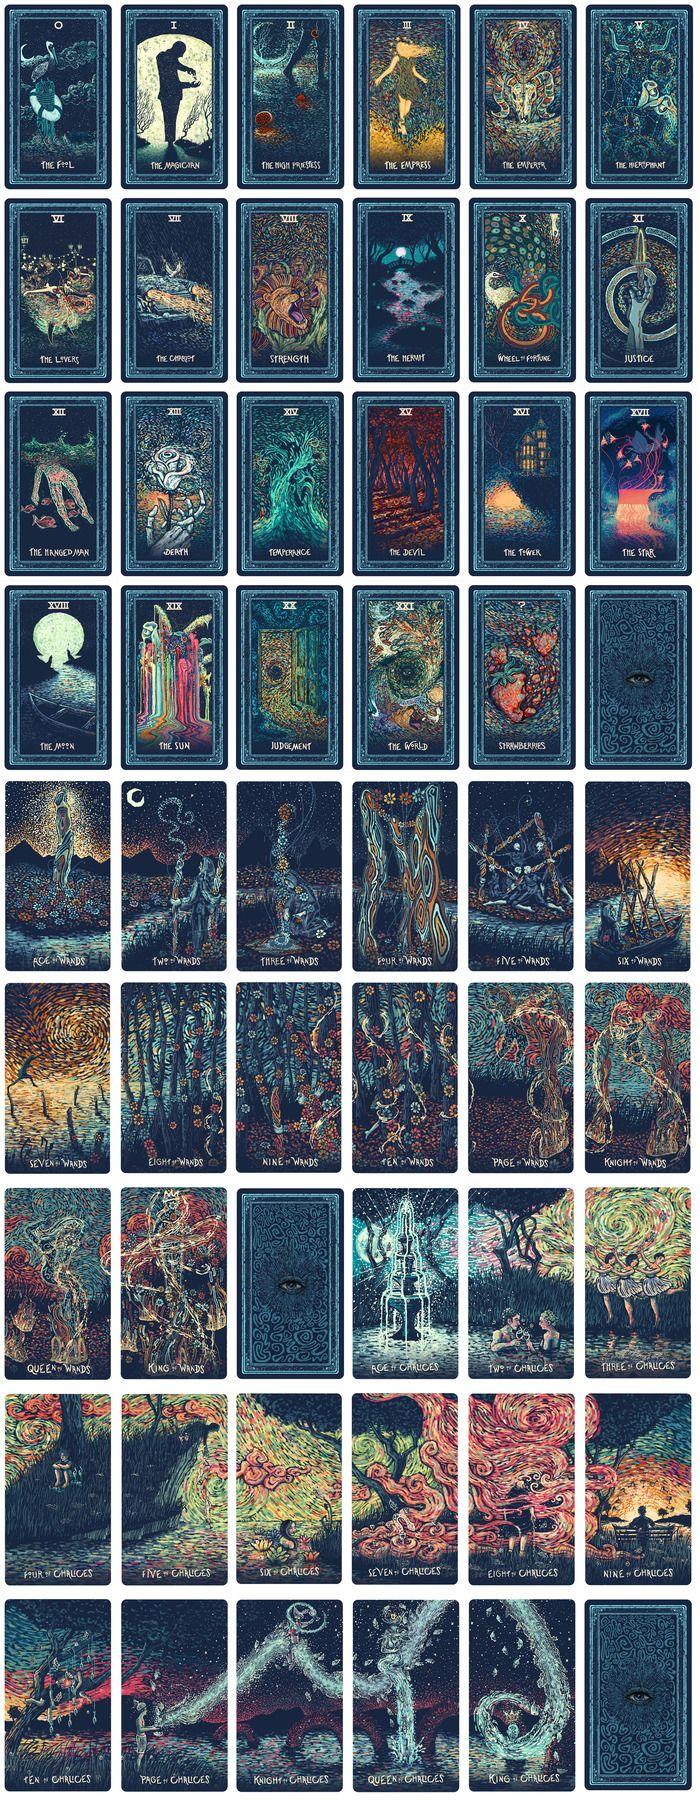 Printable Tarot Deck A Tarot Card Deck And Printable: The Prisma Visions Tarot By James R. Eads